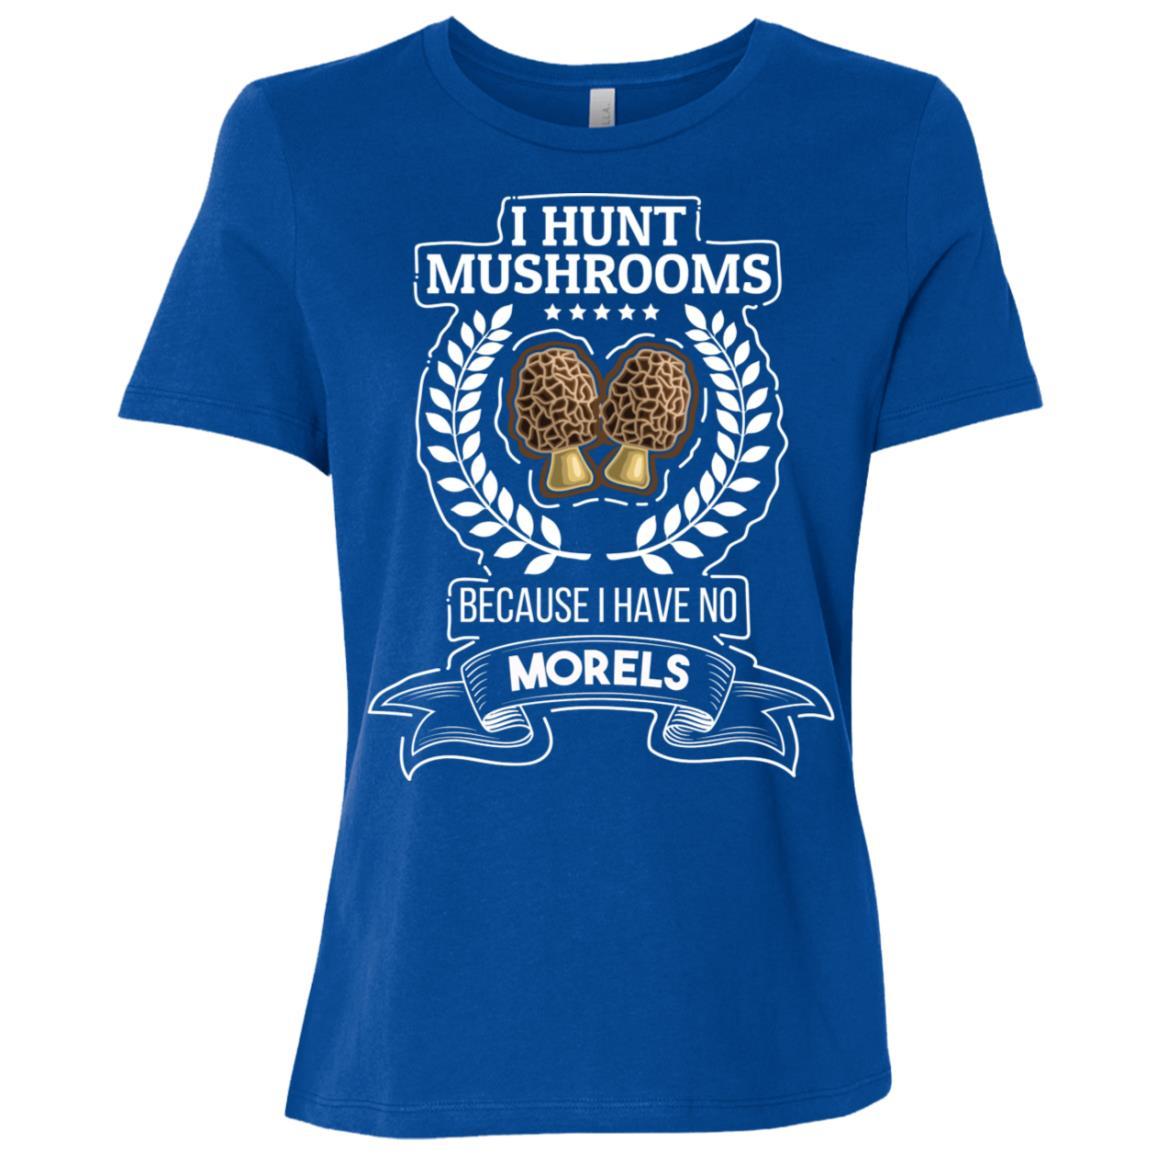 I Hunt Mushrooms Because I Have No Morels Funny Women Short Sleeve T-Shirt